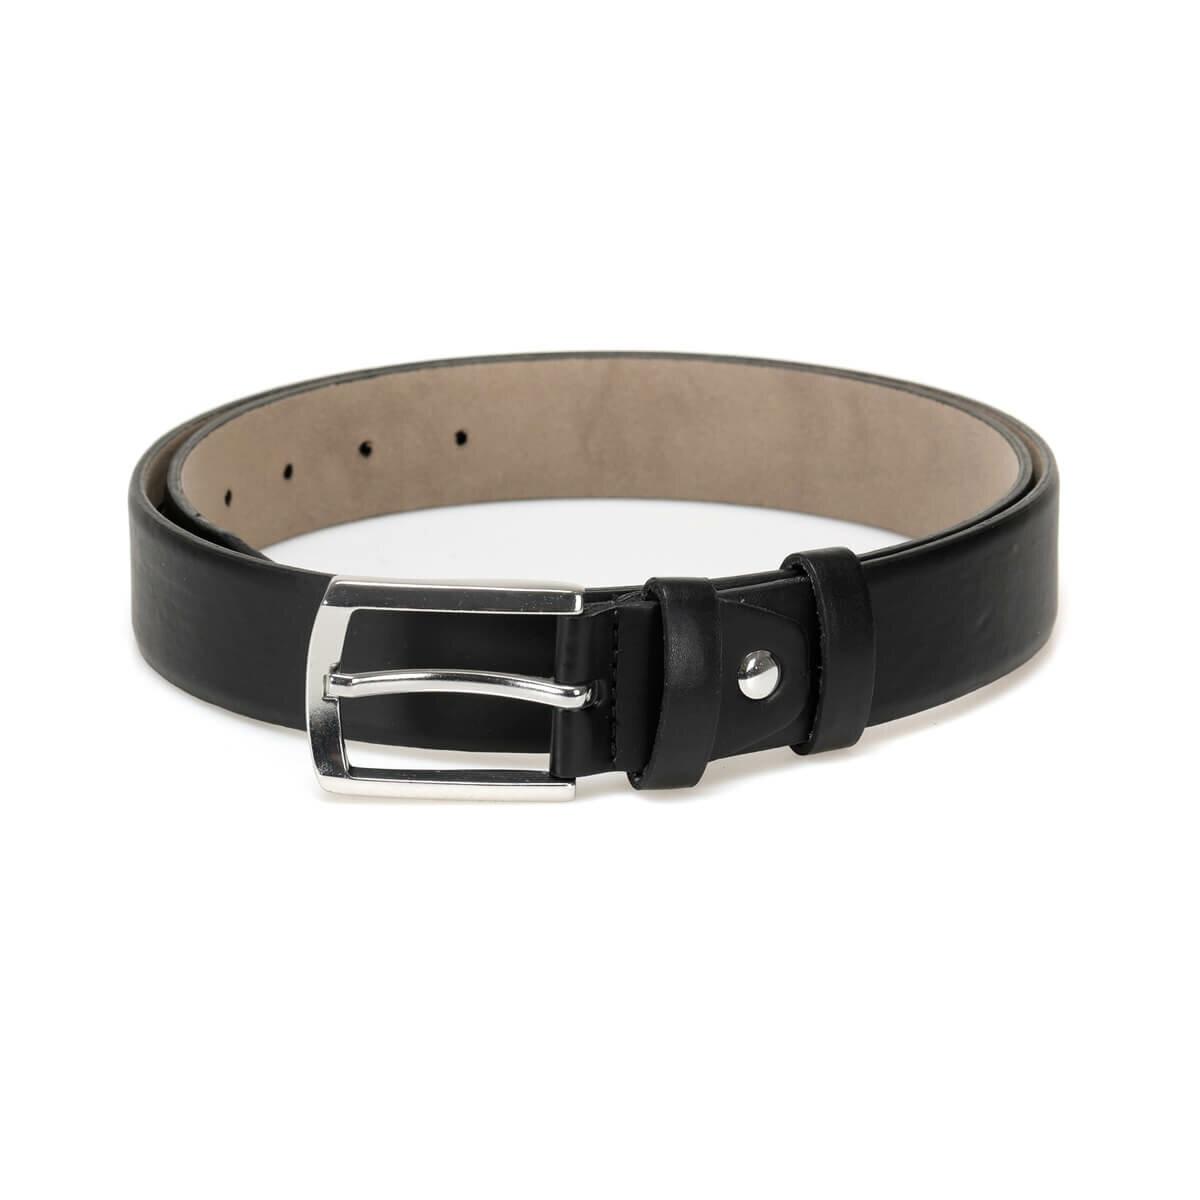 FLO MBRA3505 Black Male Belt Garamond